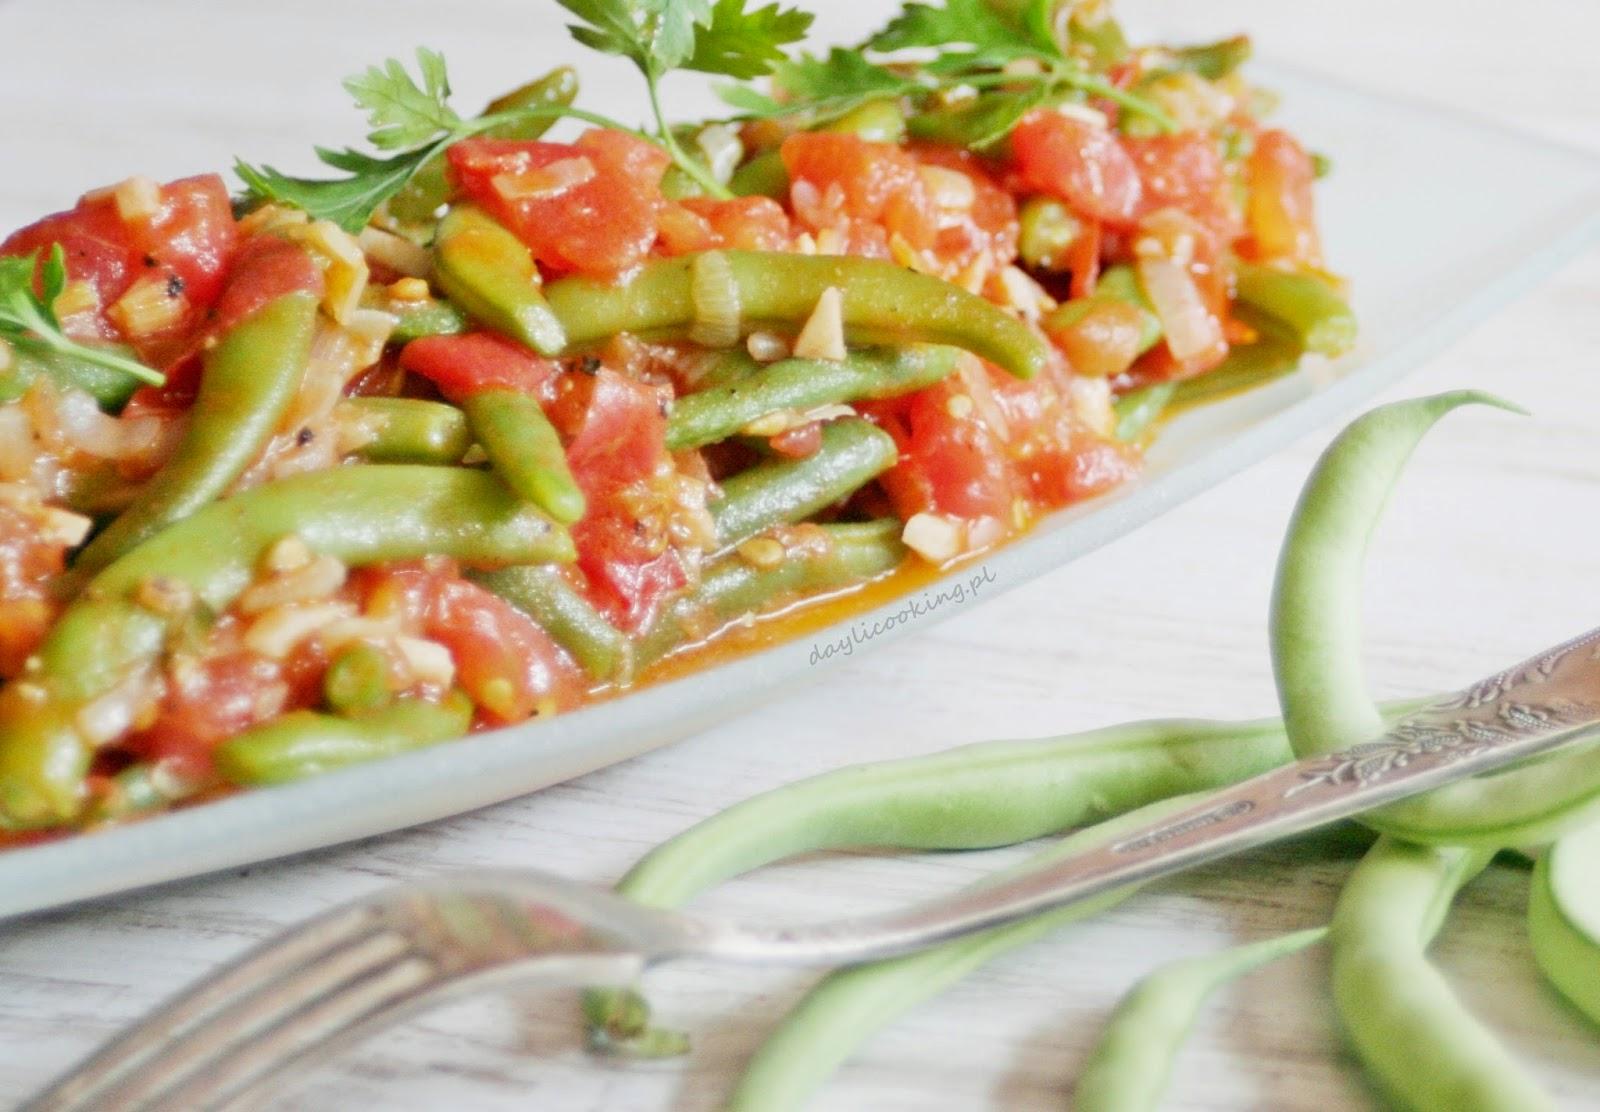 Fasolka szparagowa w pomidorach